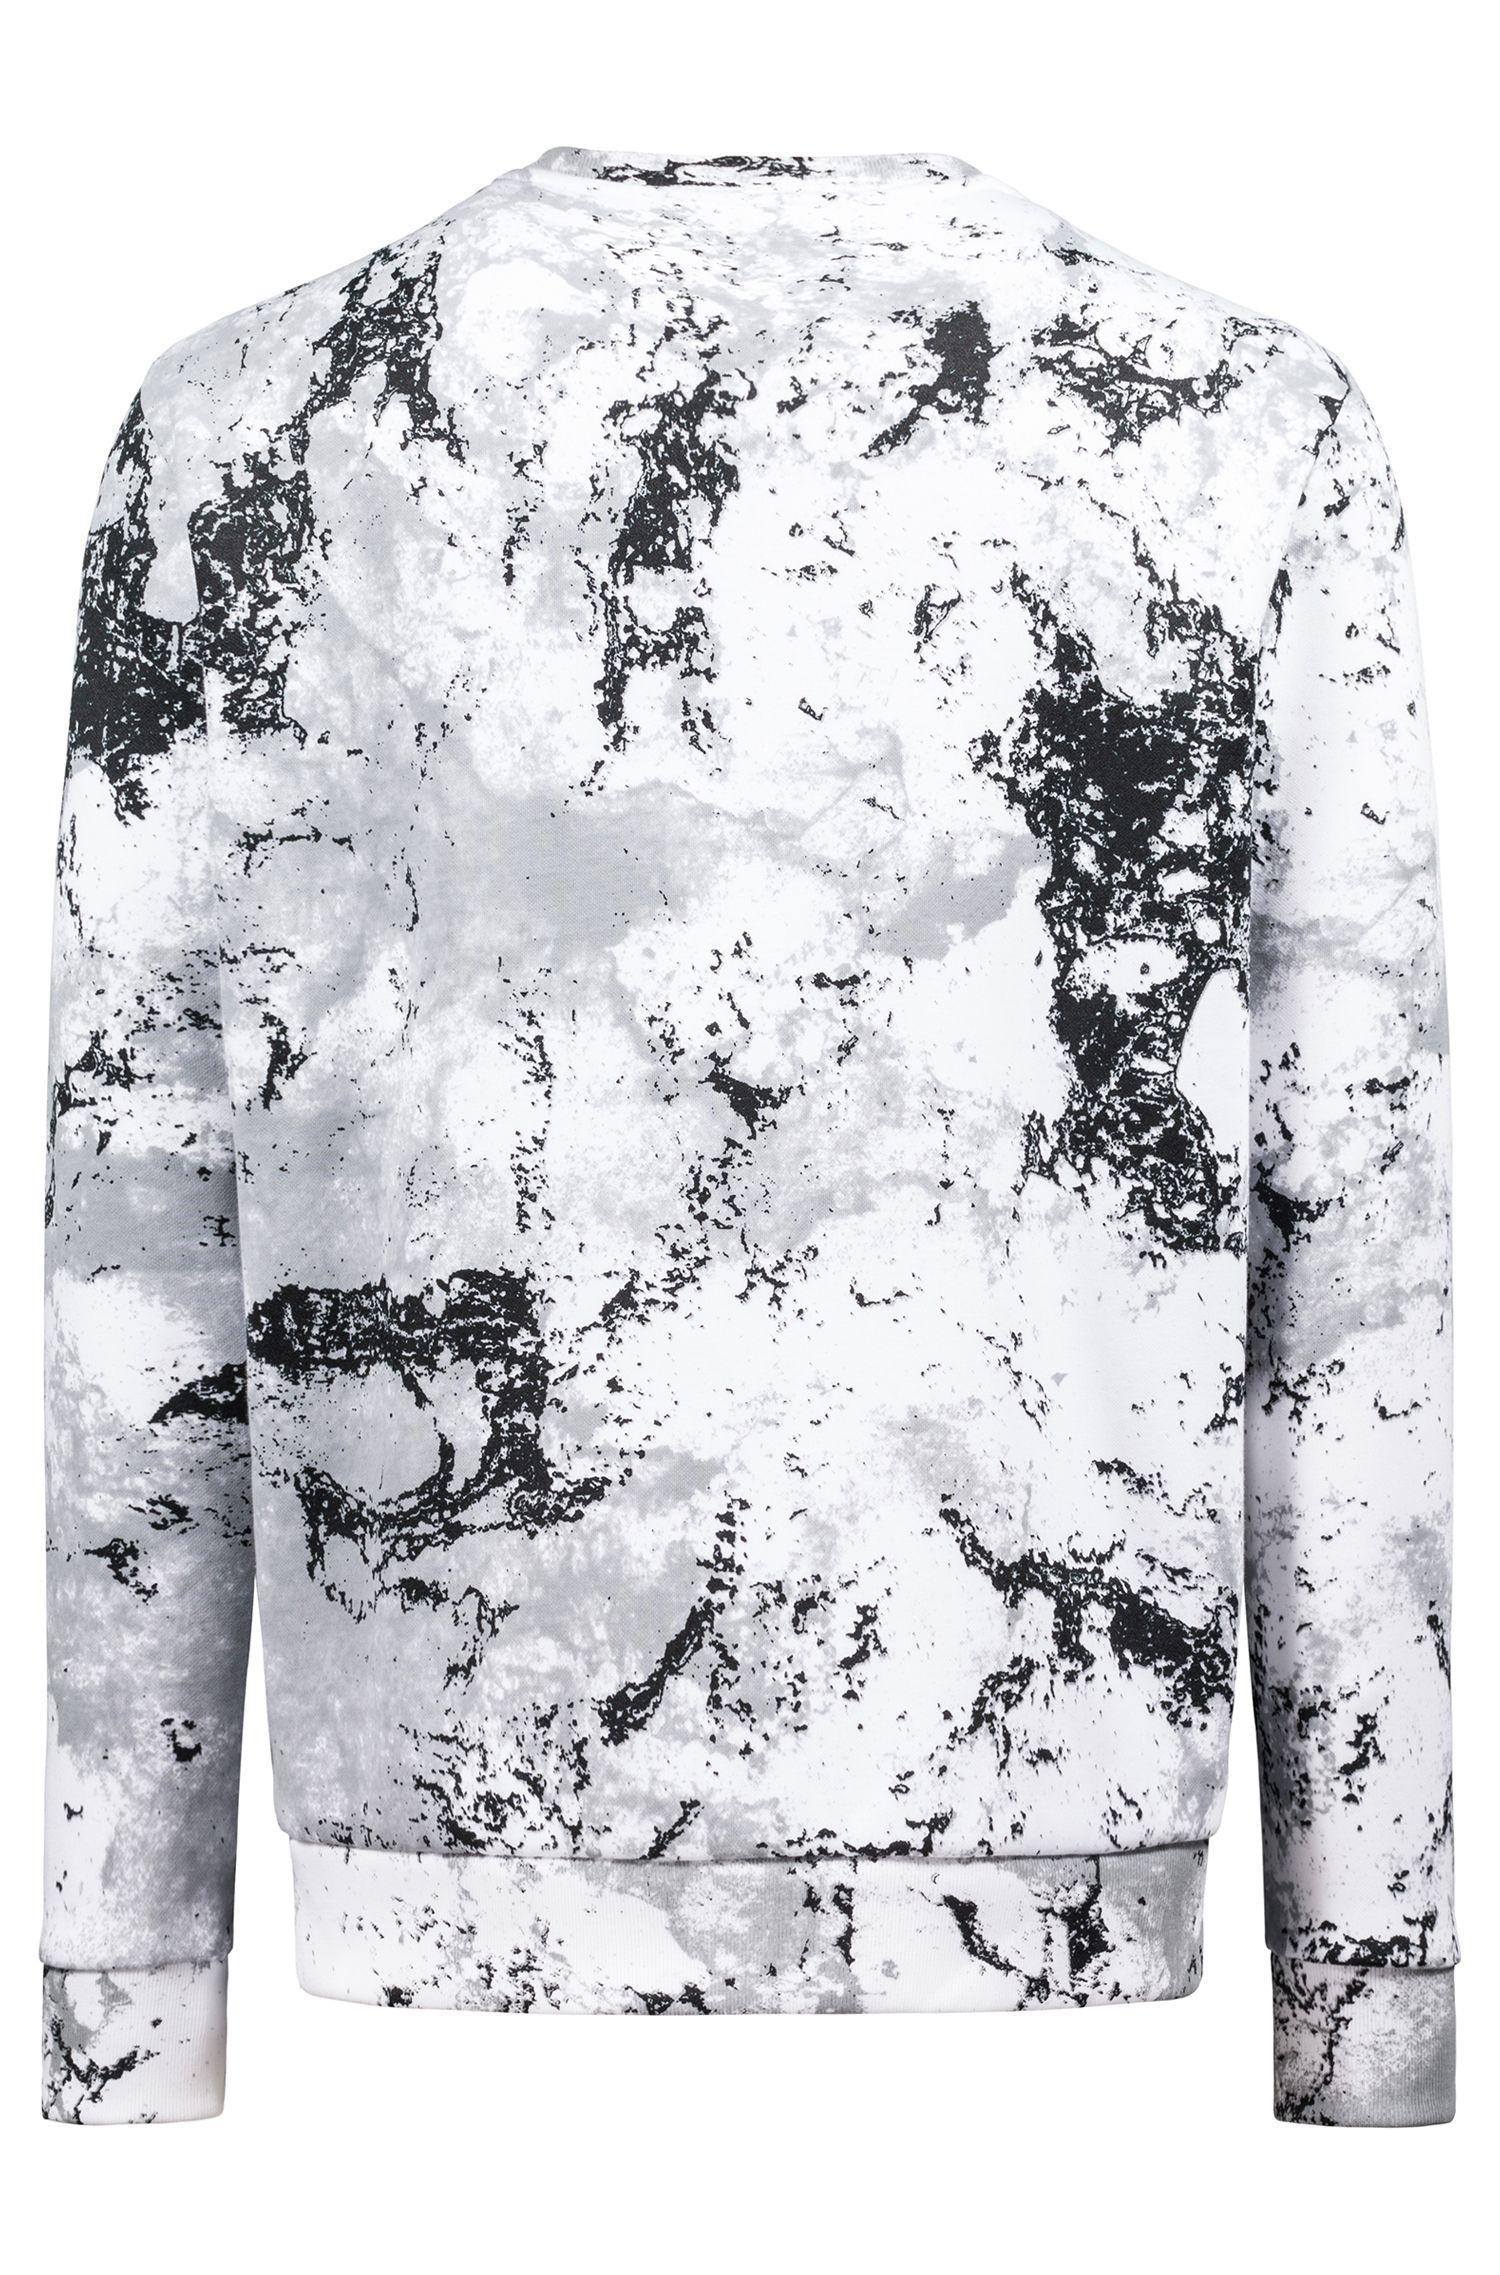 Oversized-fit fleece sweatshirt in snow-camouflage print, Patterned